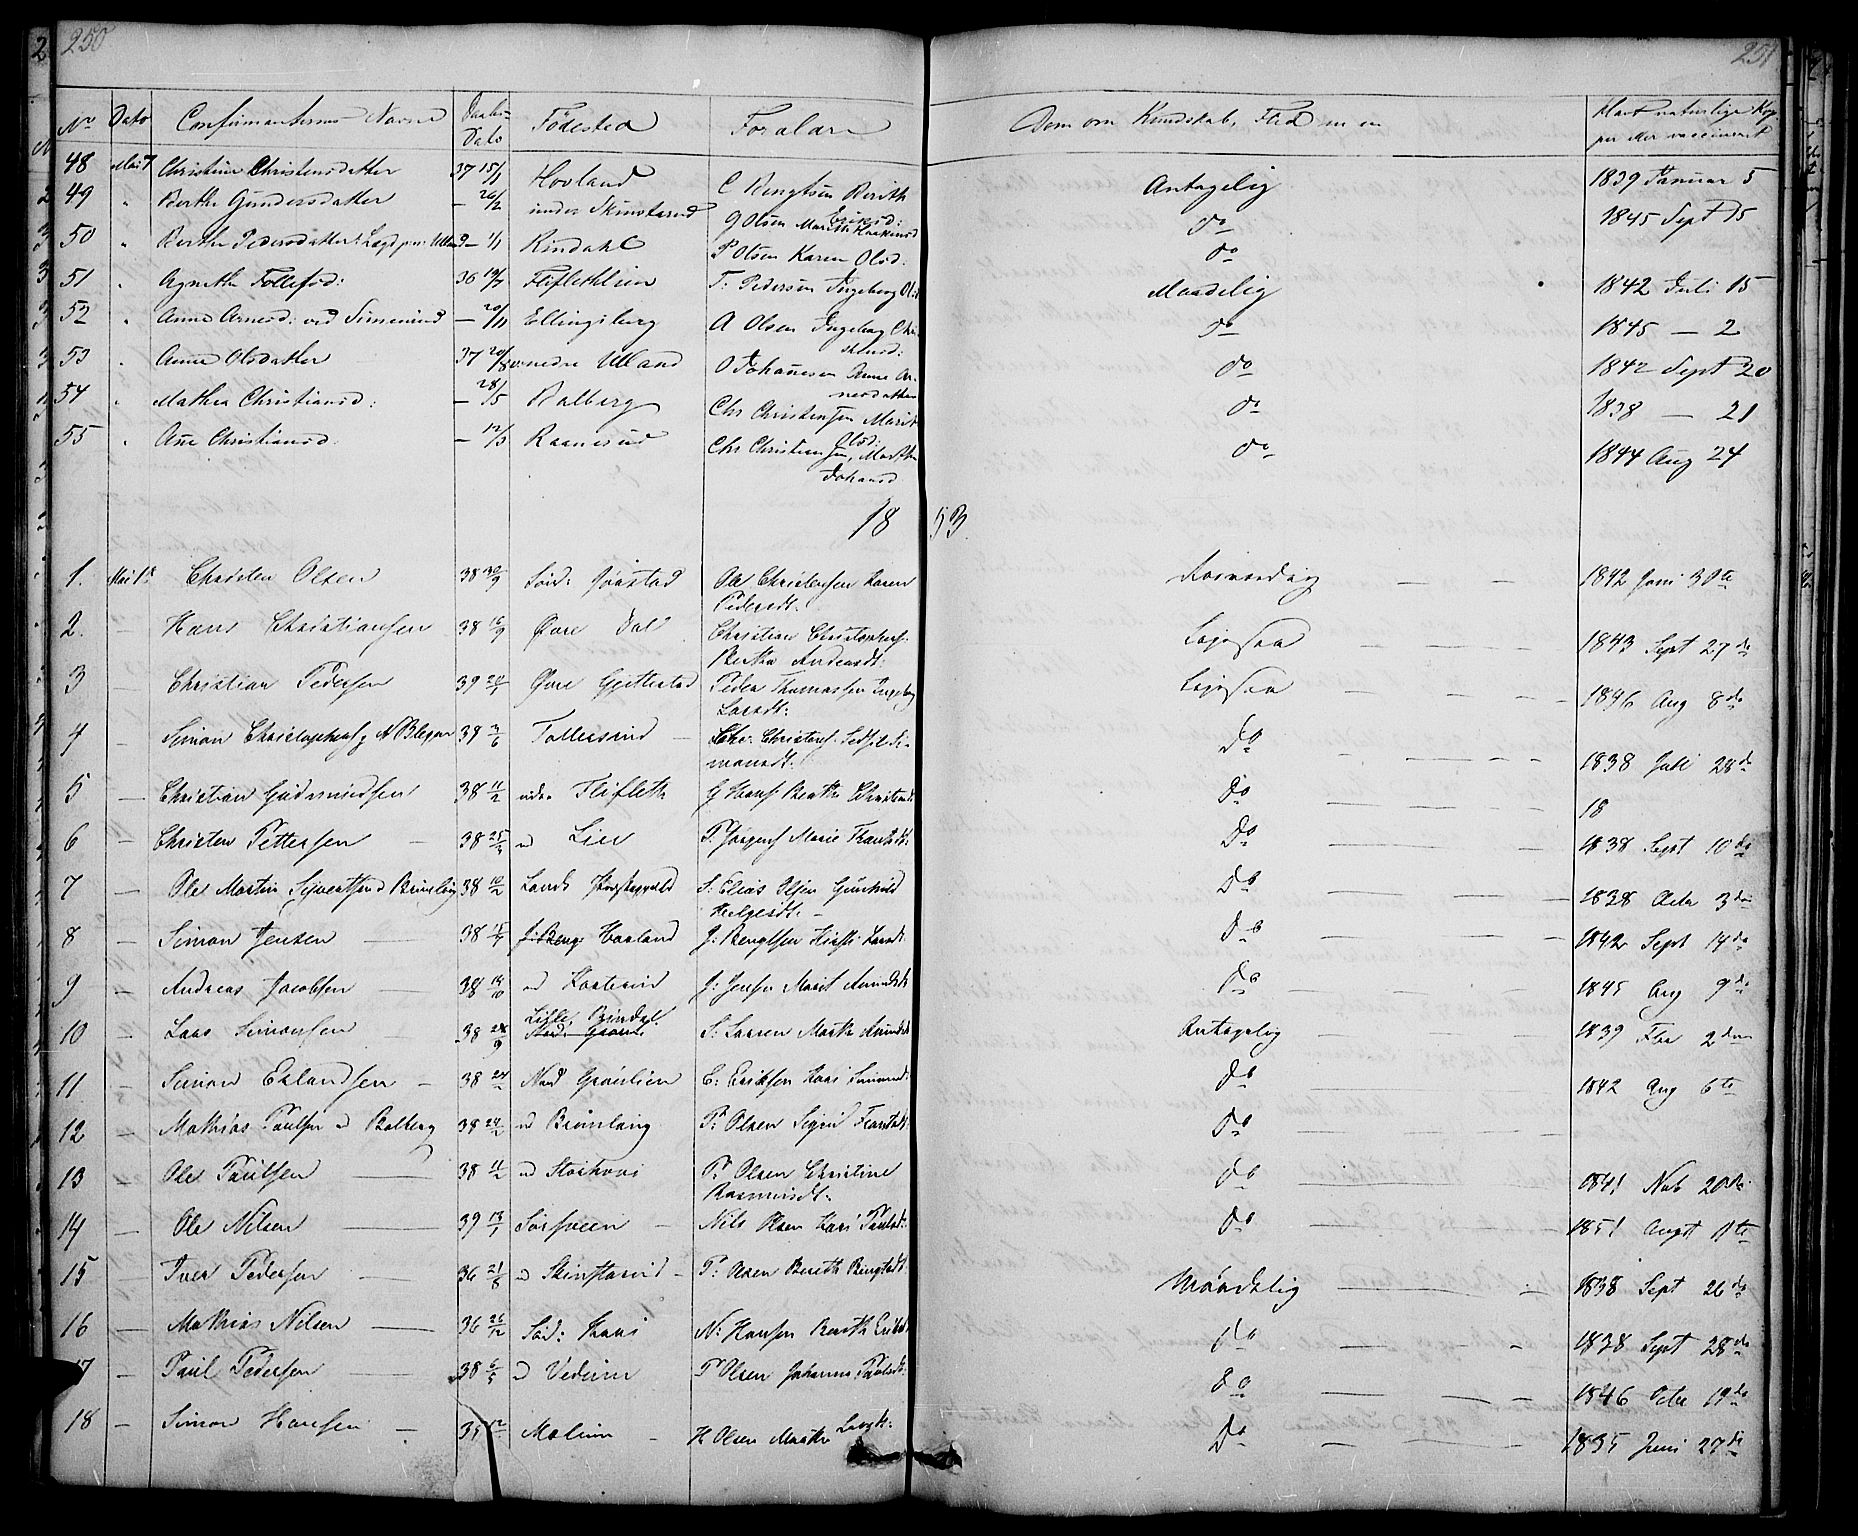 SAH, Fåberg prestekontor, Klokkerbok nr. 5, 1837-1864, s. 250-251